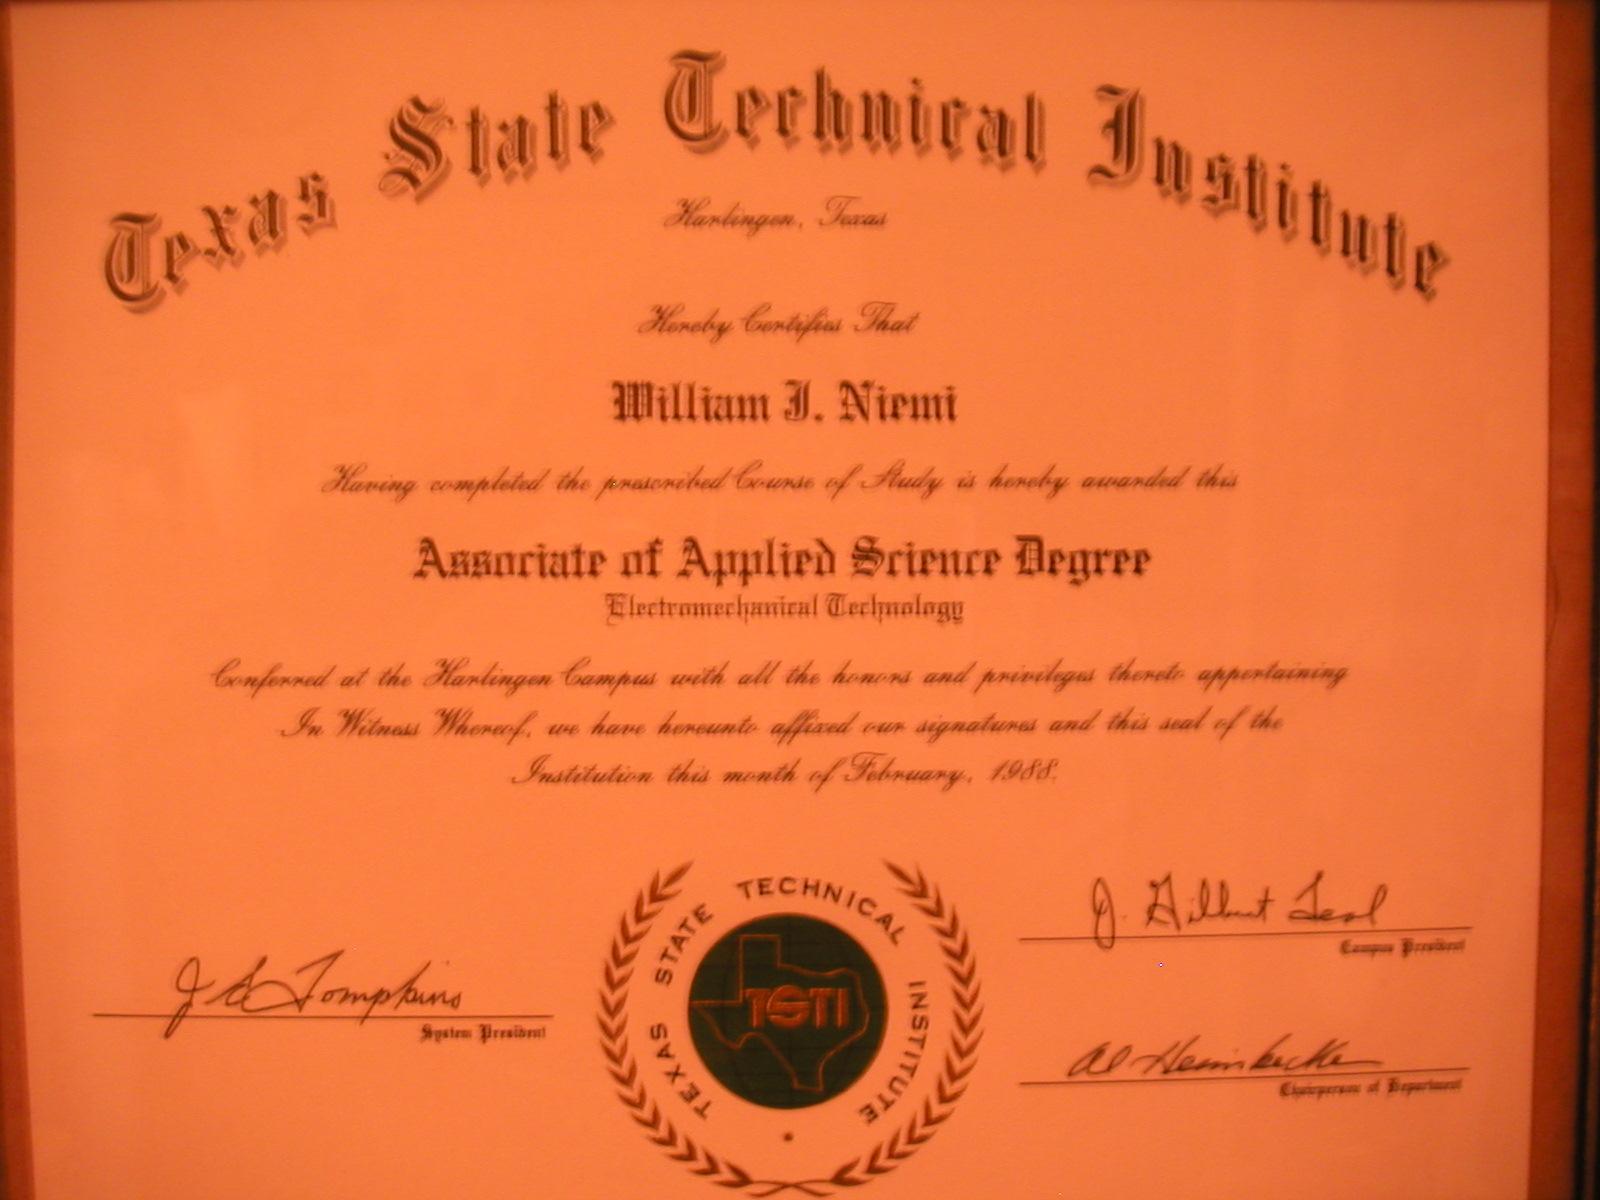 Associate S Degree Robotics And Automation Euphonic Studio At